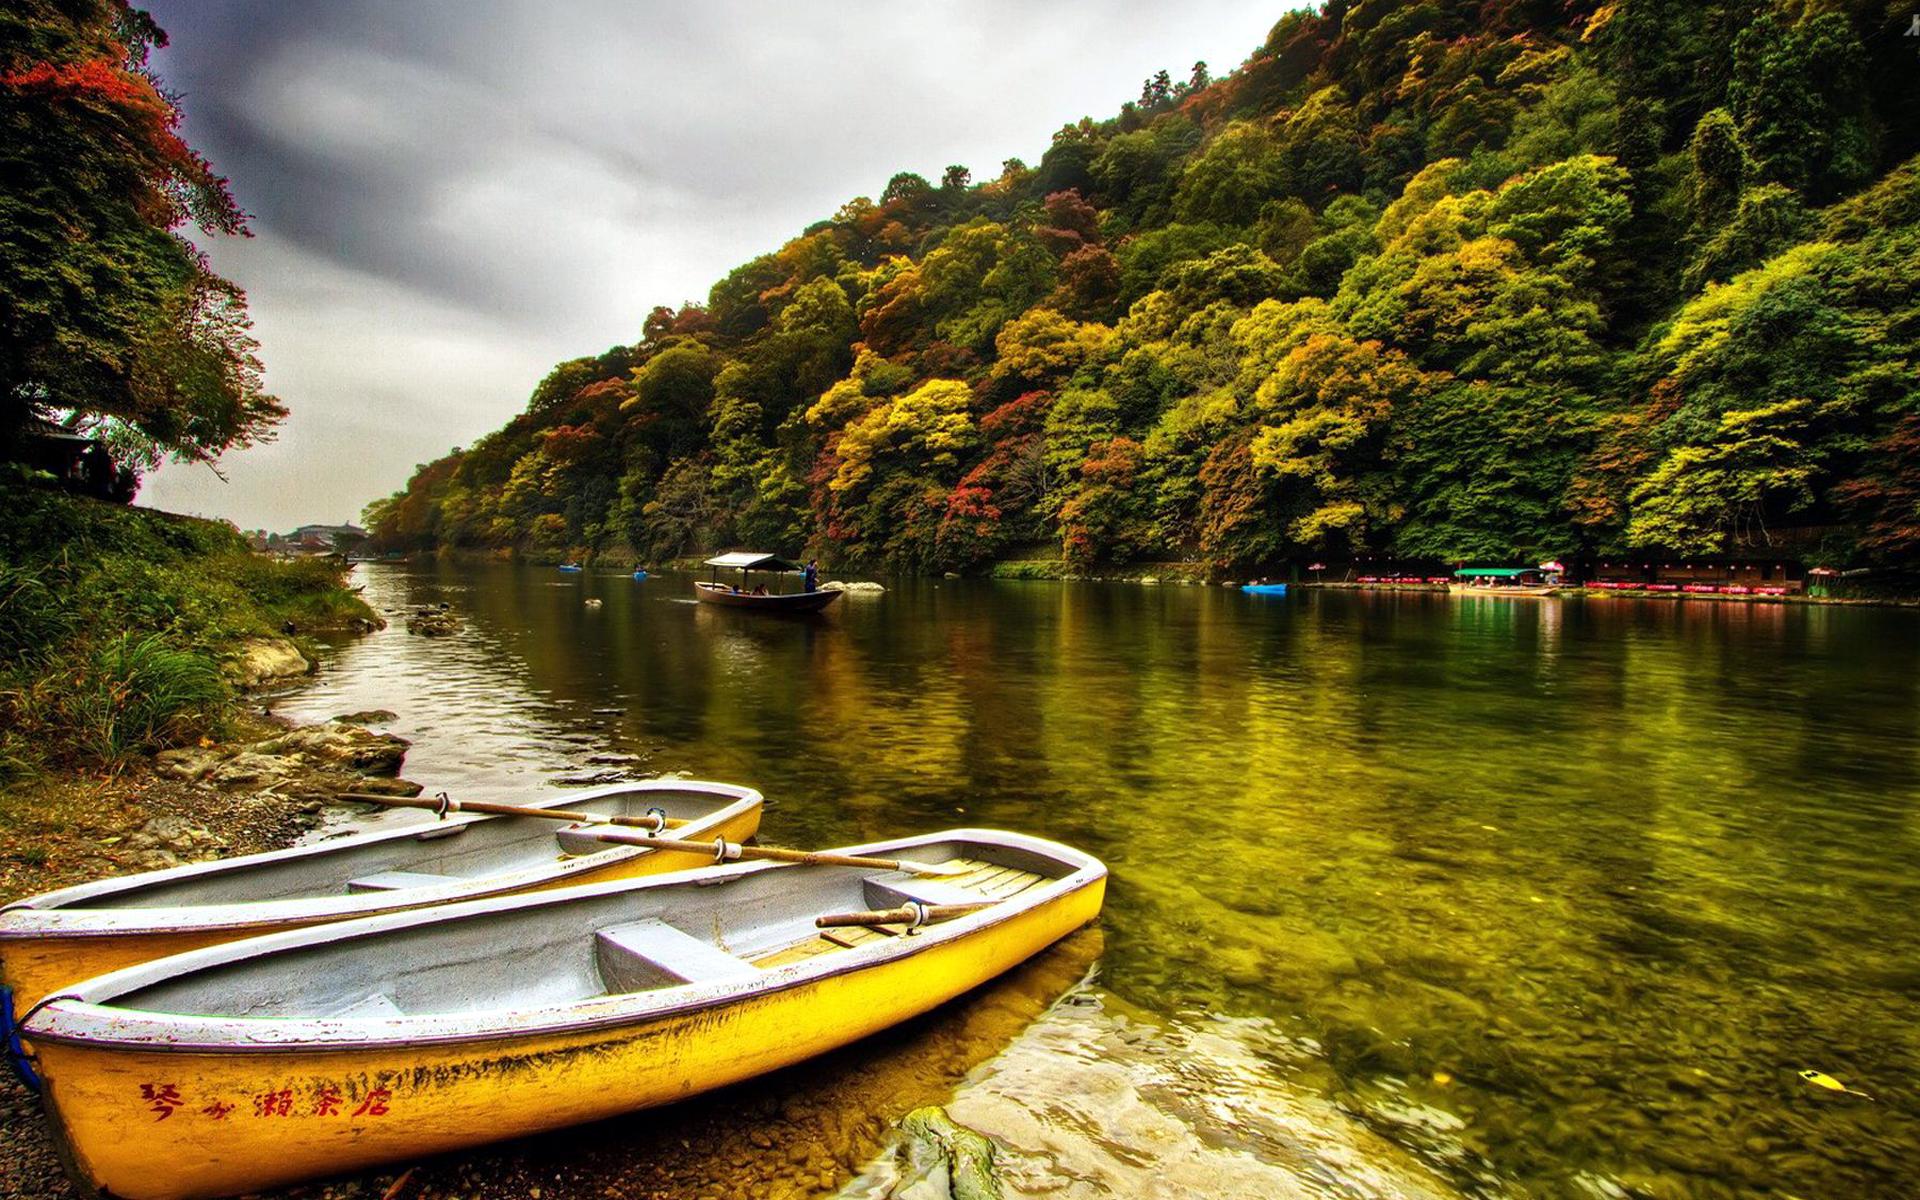 river_nature_mobile_wallpaper.jpg